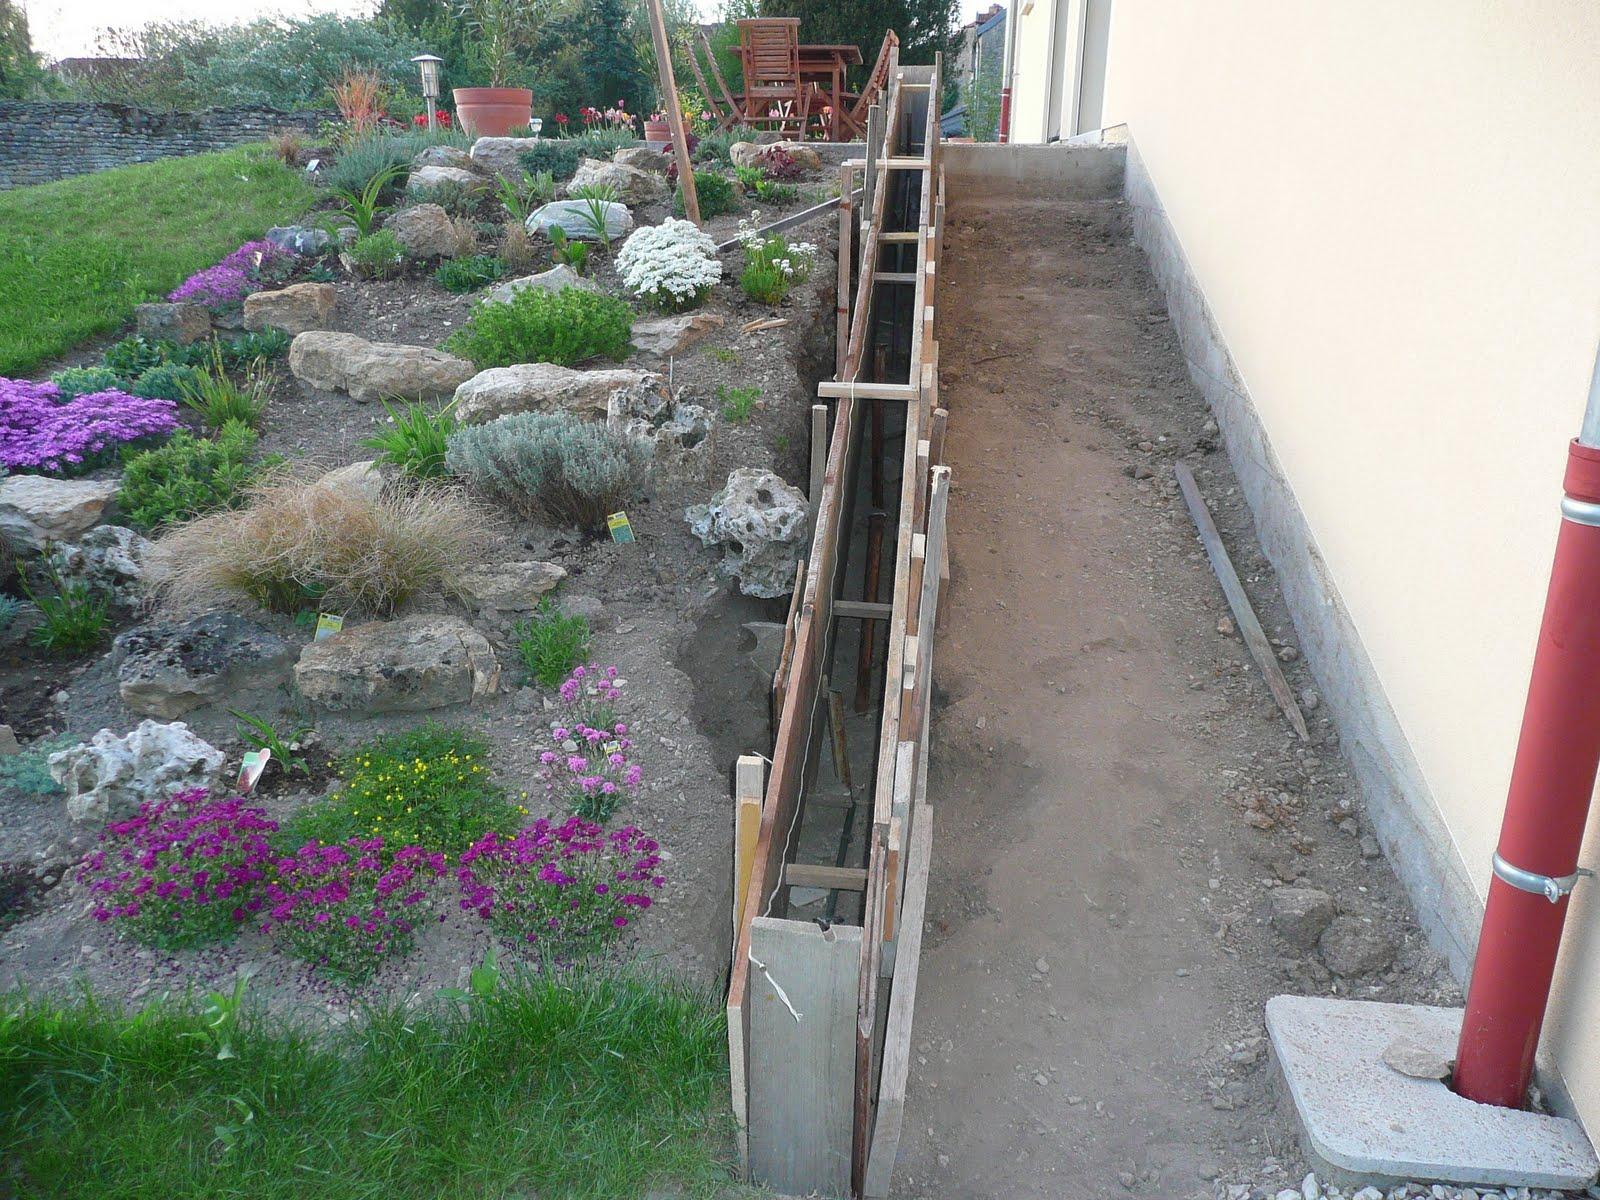 Notre jardin secret.: Plantes alpines...